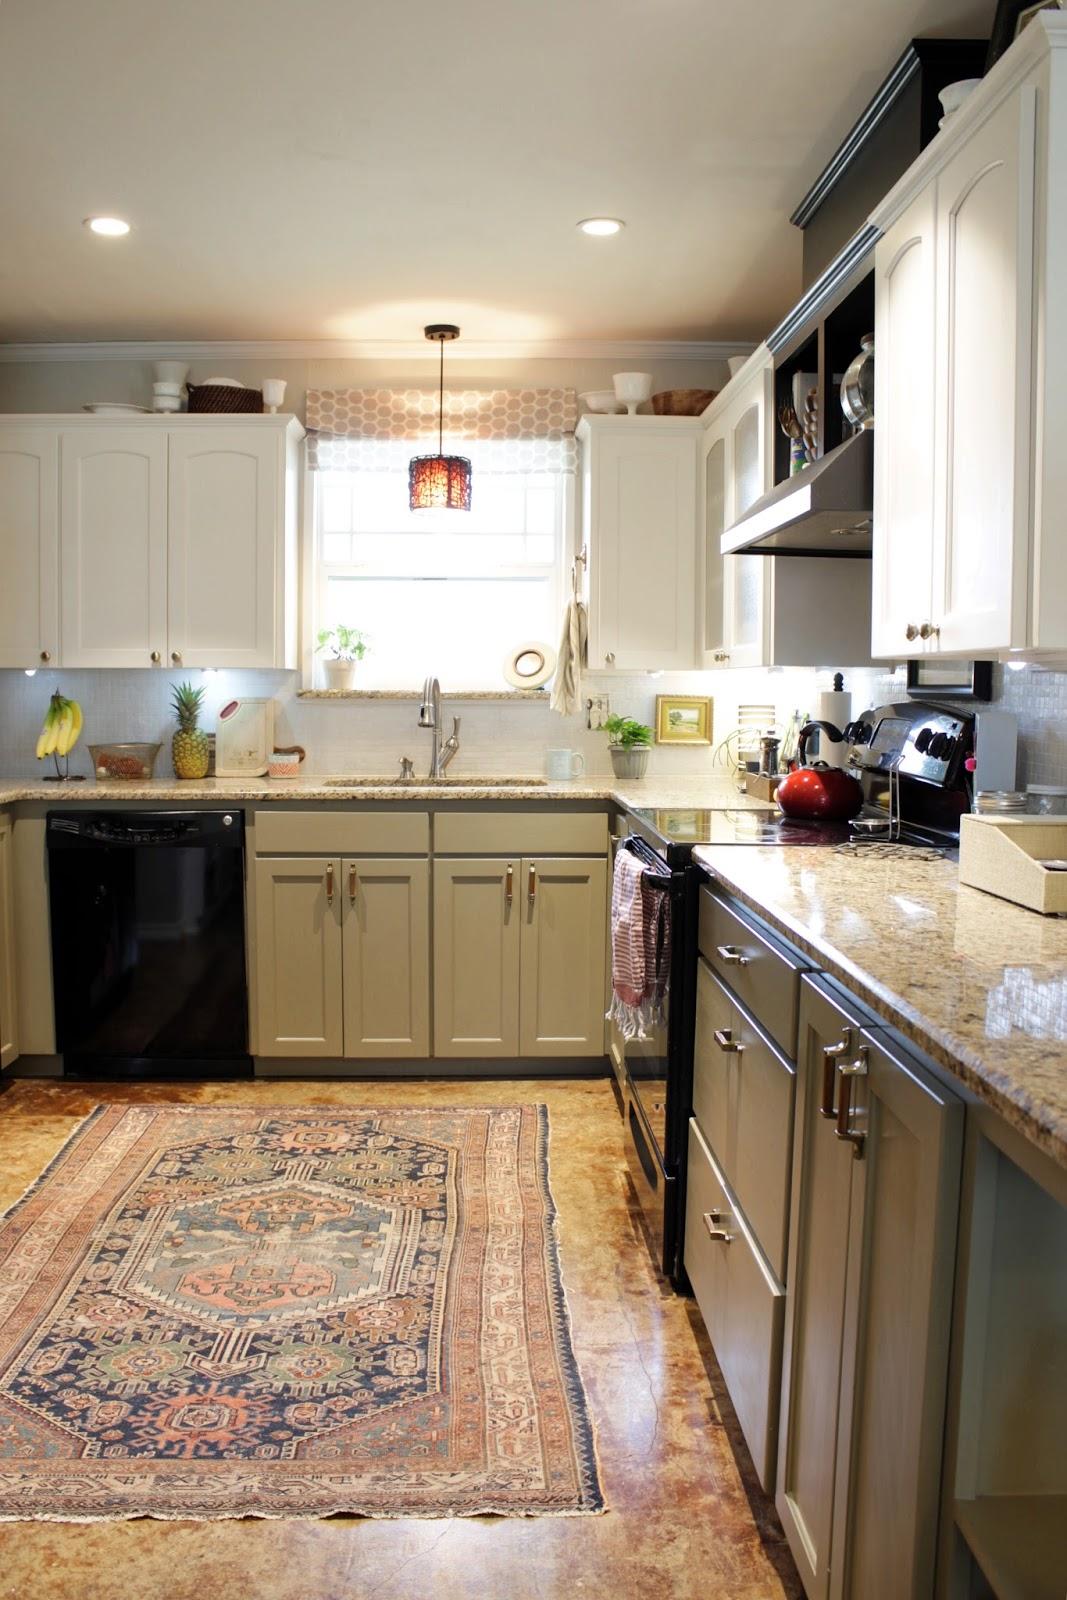 Update Kitchen House Homemade Adding Brass A Quick Kitchen Update